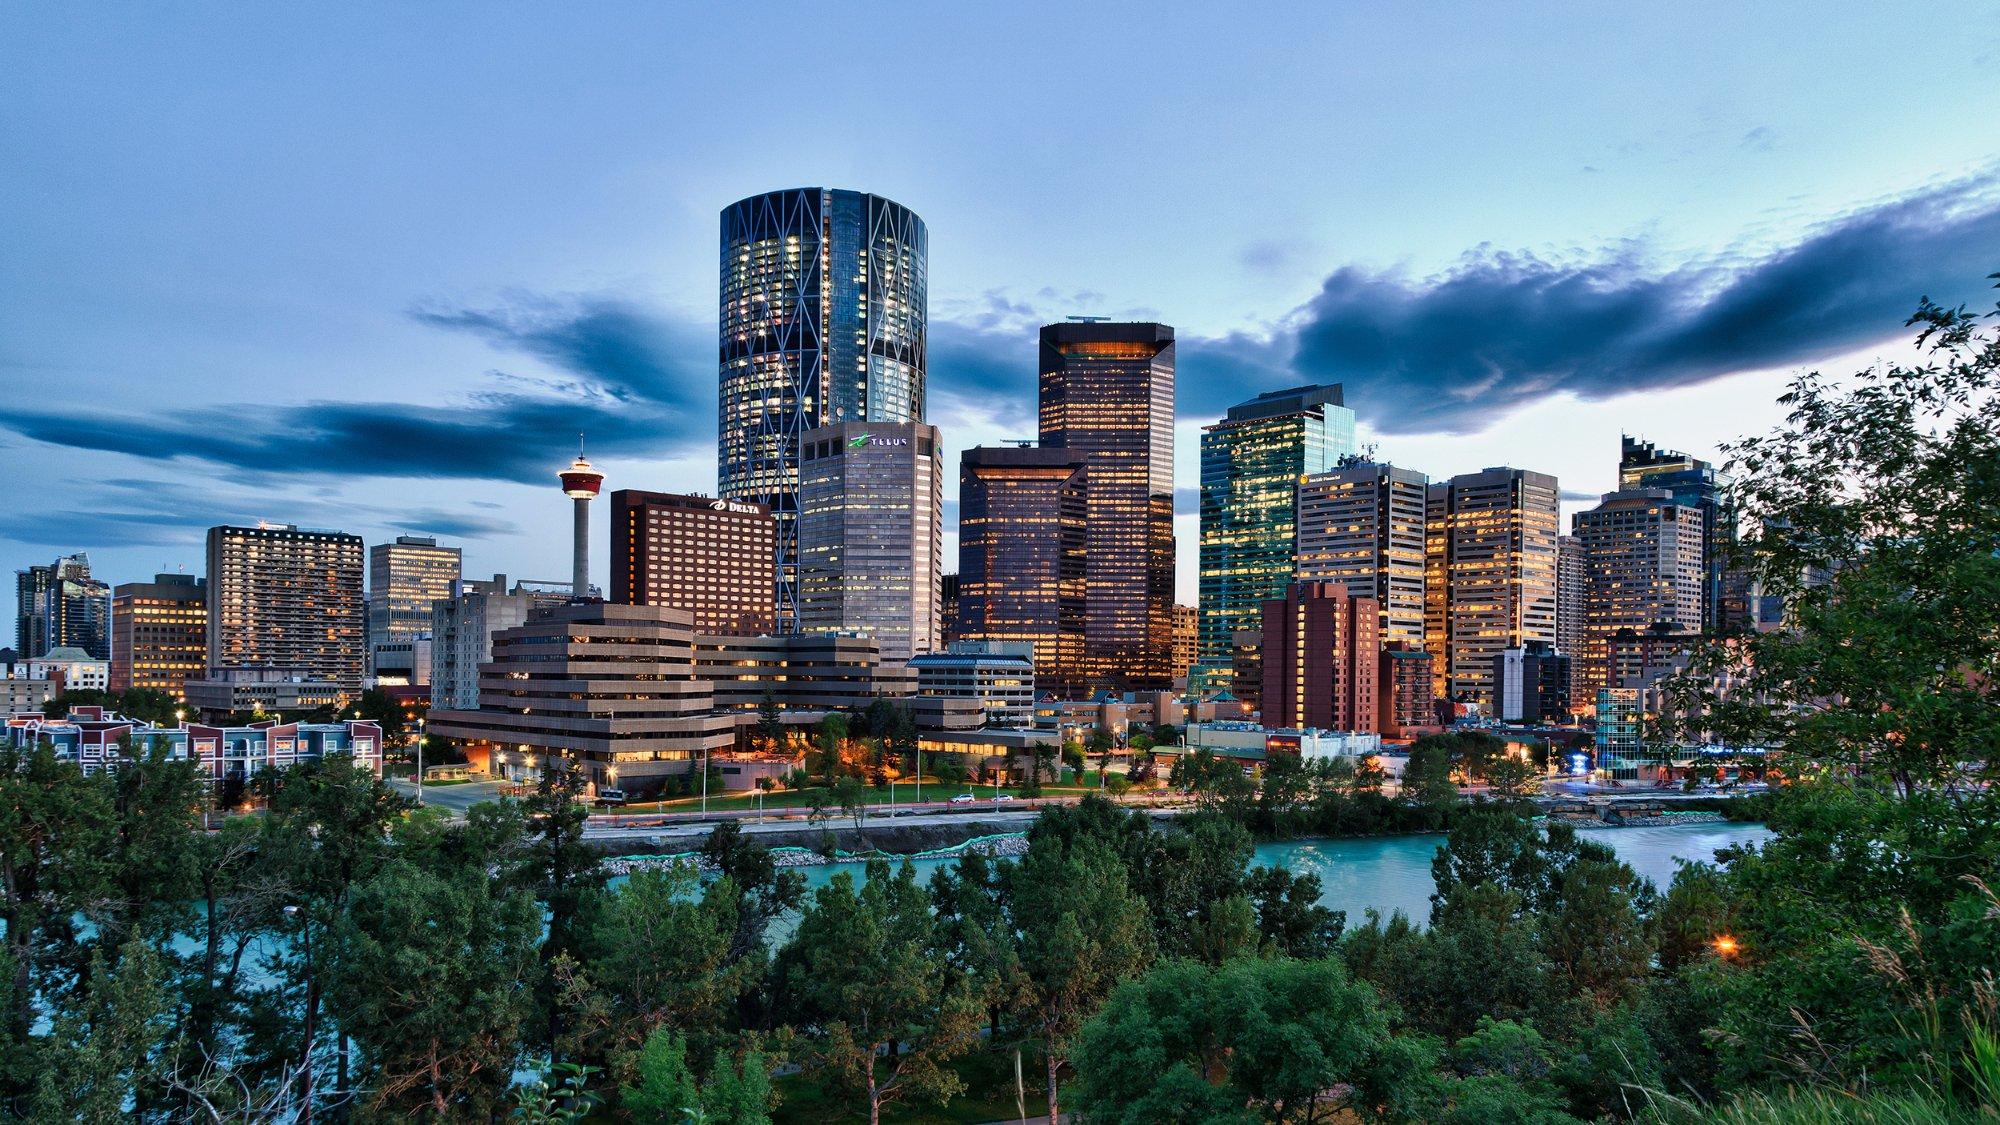 City og Calgary Downtown